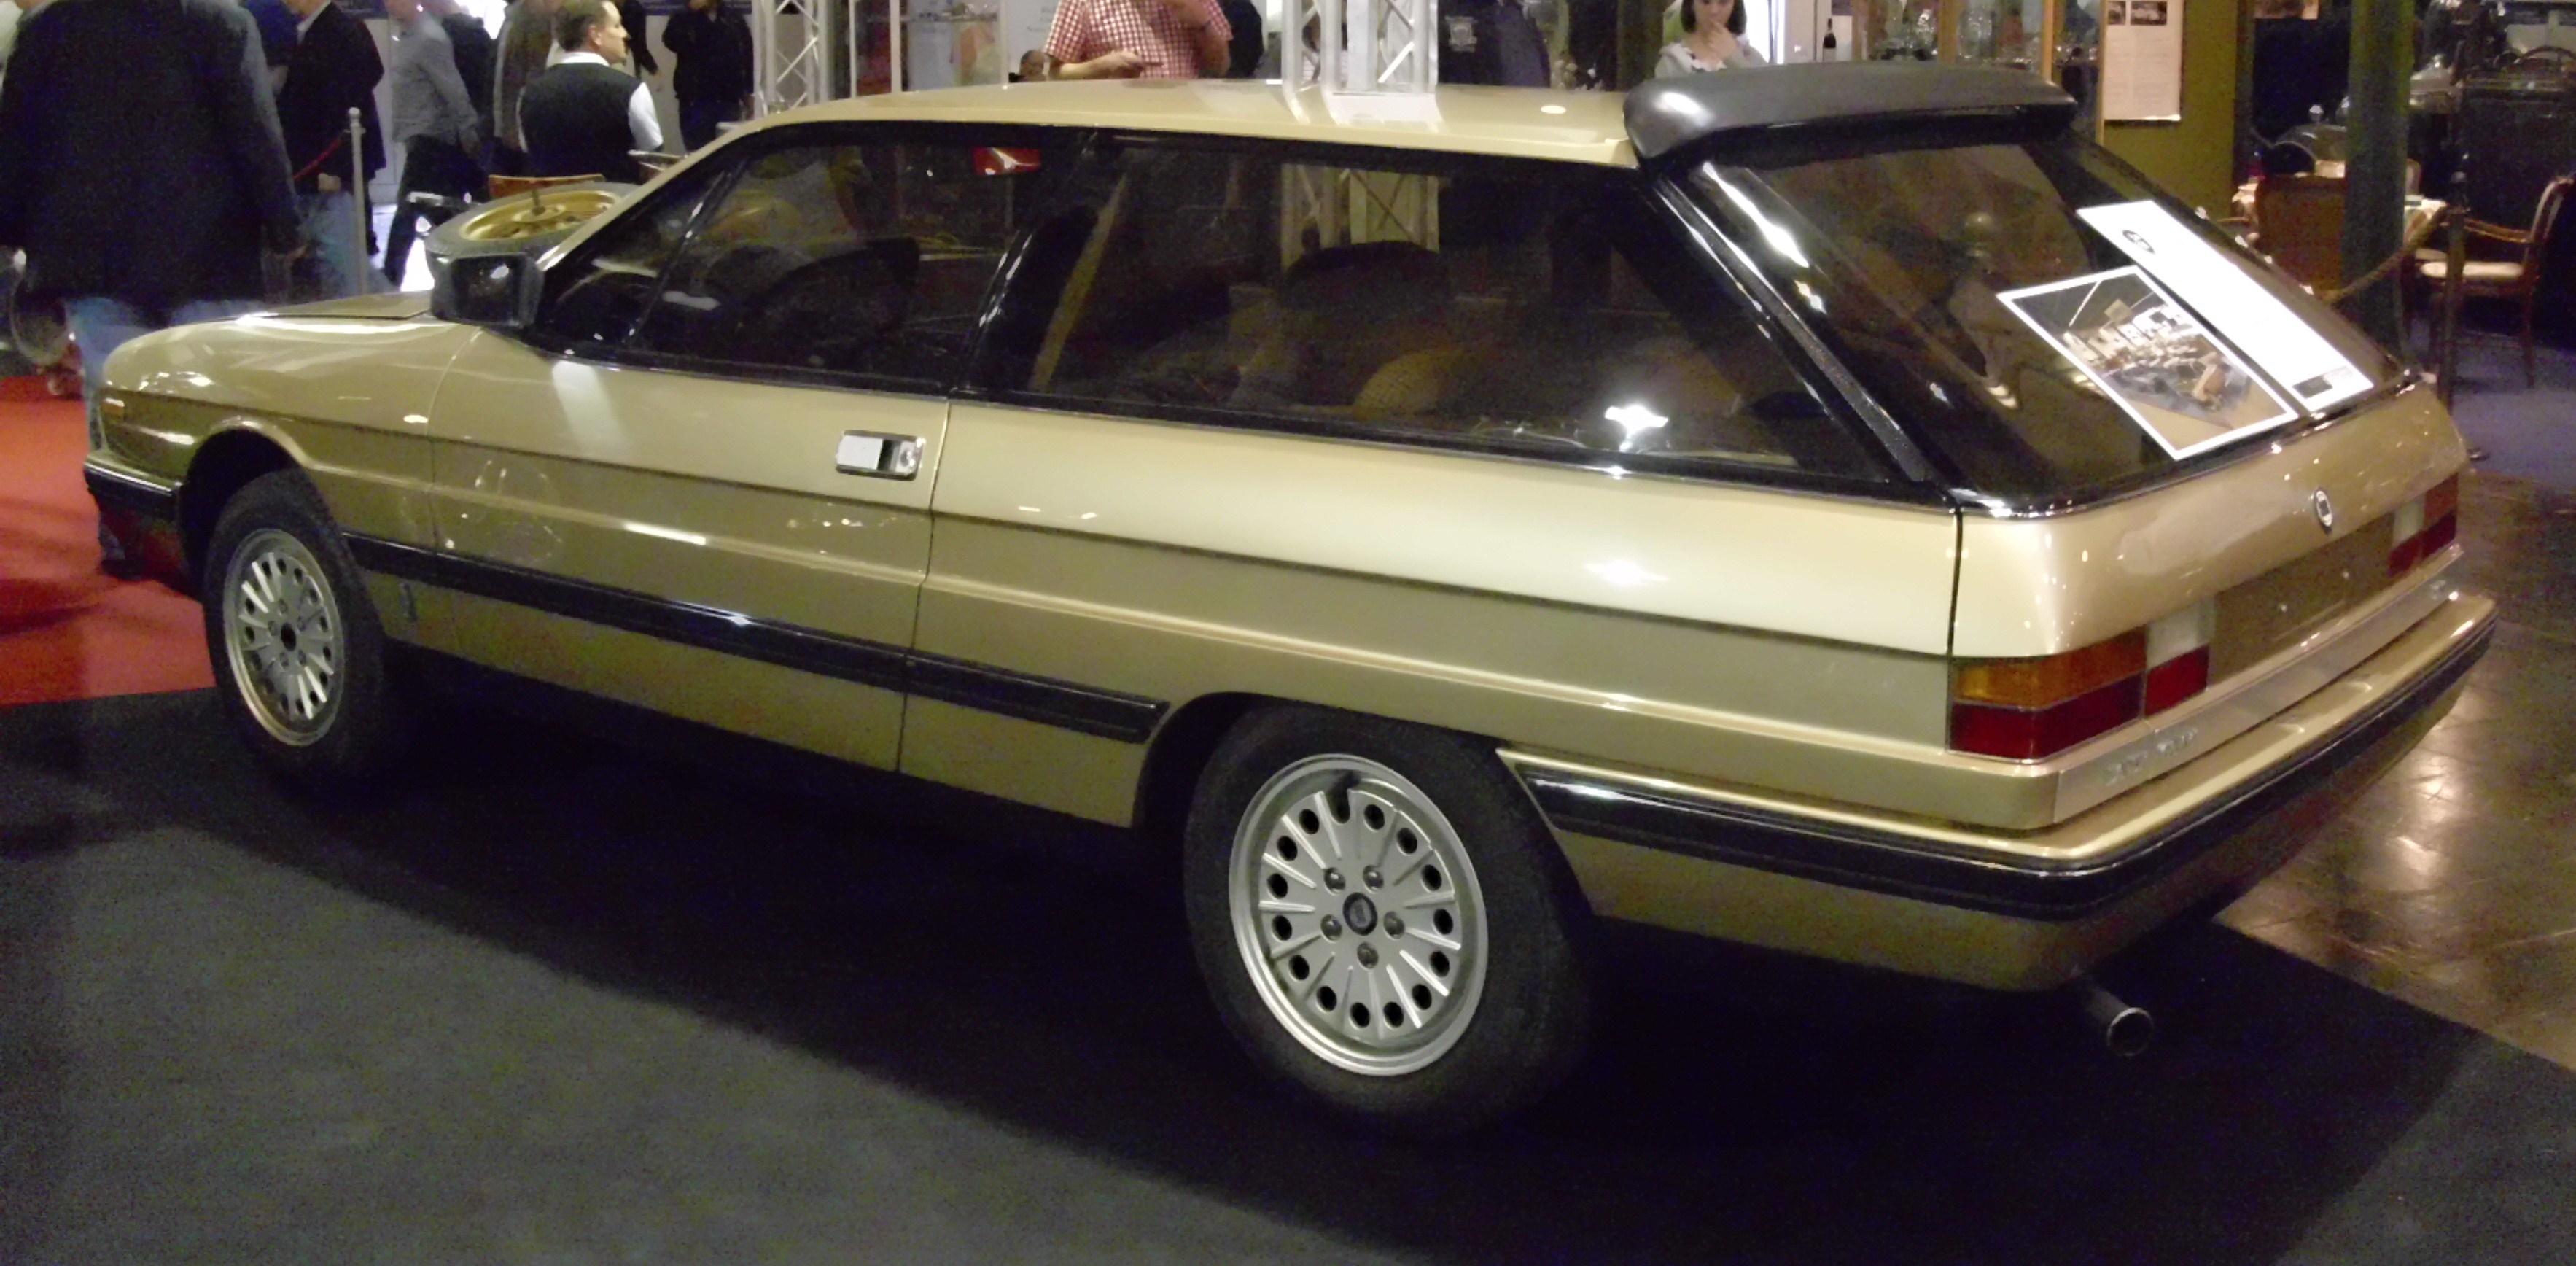 https://upload.wikimedia.org/wikipedia/commons/b/b5/Lancia_Gamma_Olgiata_1982_schr%C3%A4g.JPG